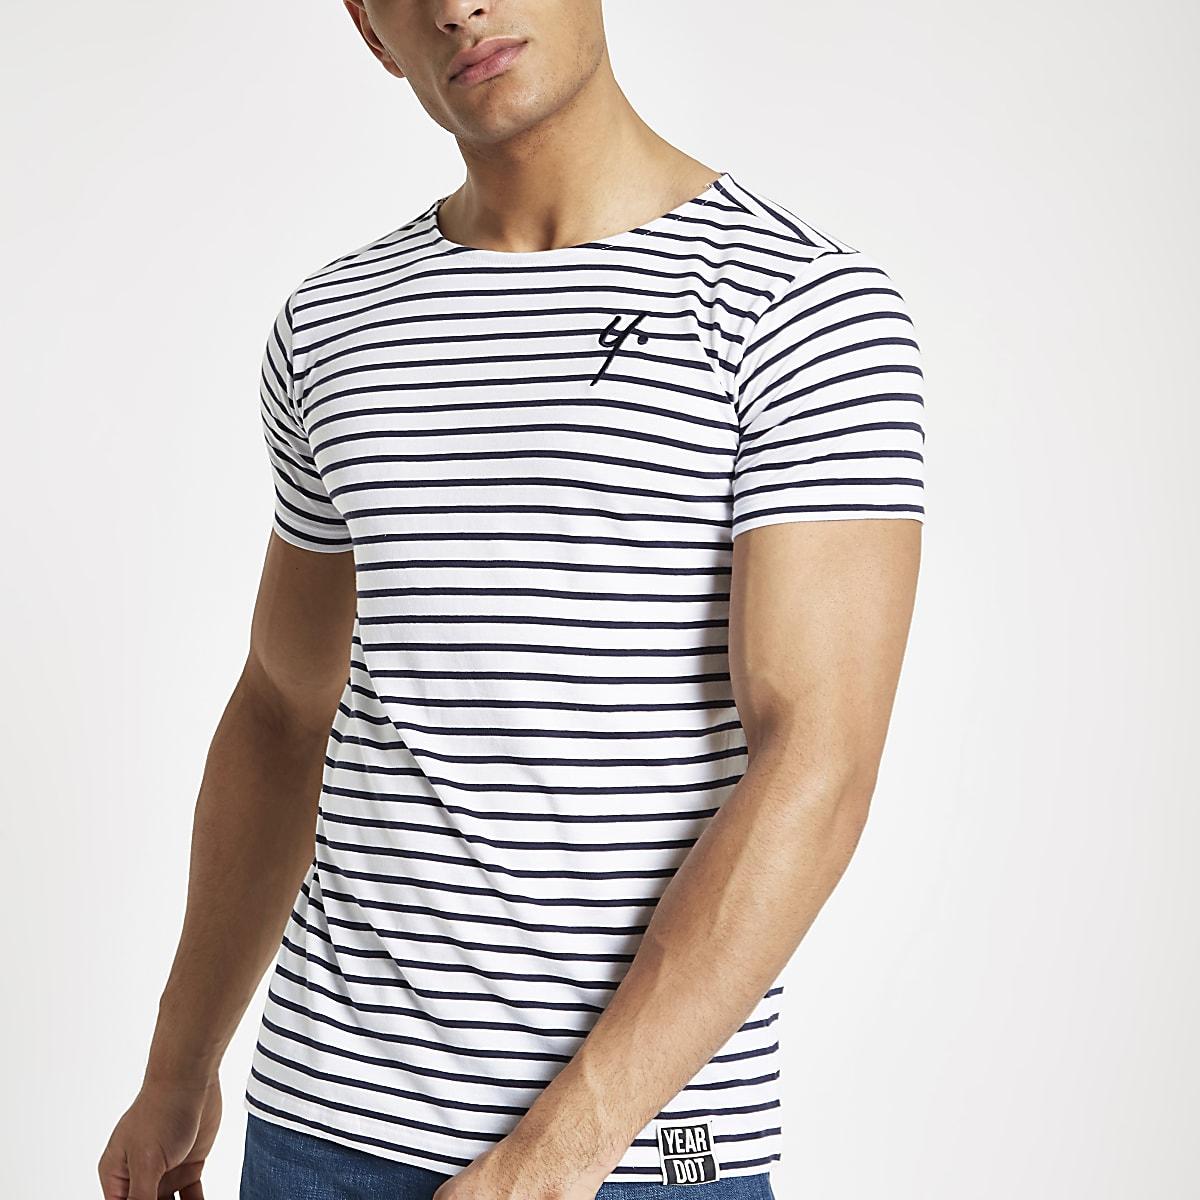 Year Dot - Wit gestreept T-shirt